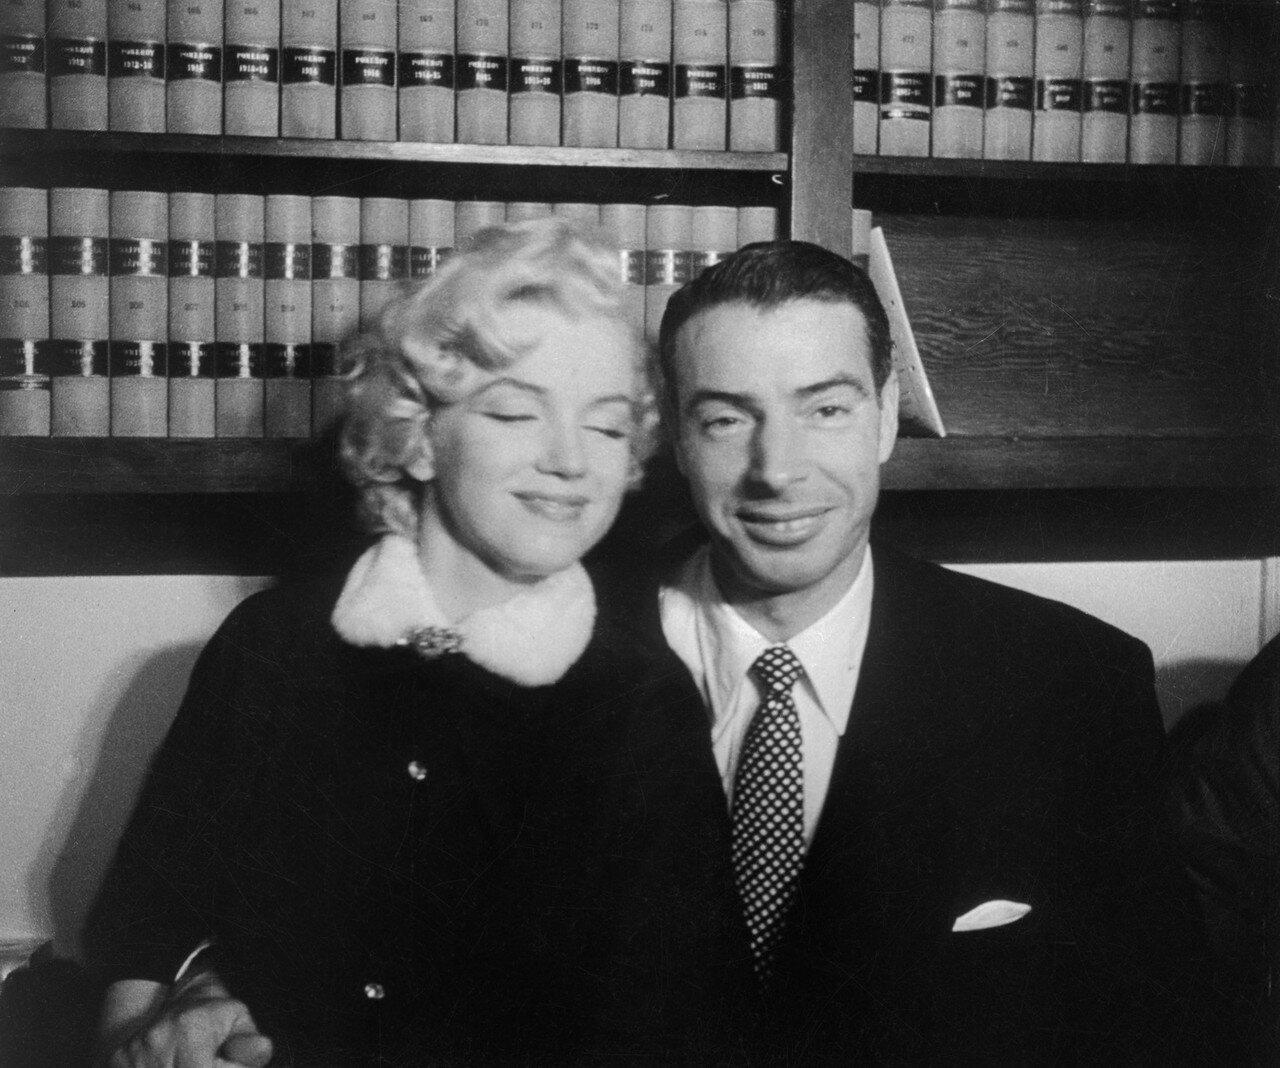 Marilyn Monroe Sitting with Joe DiMaggio